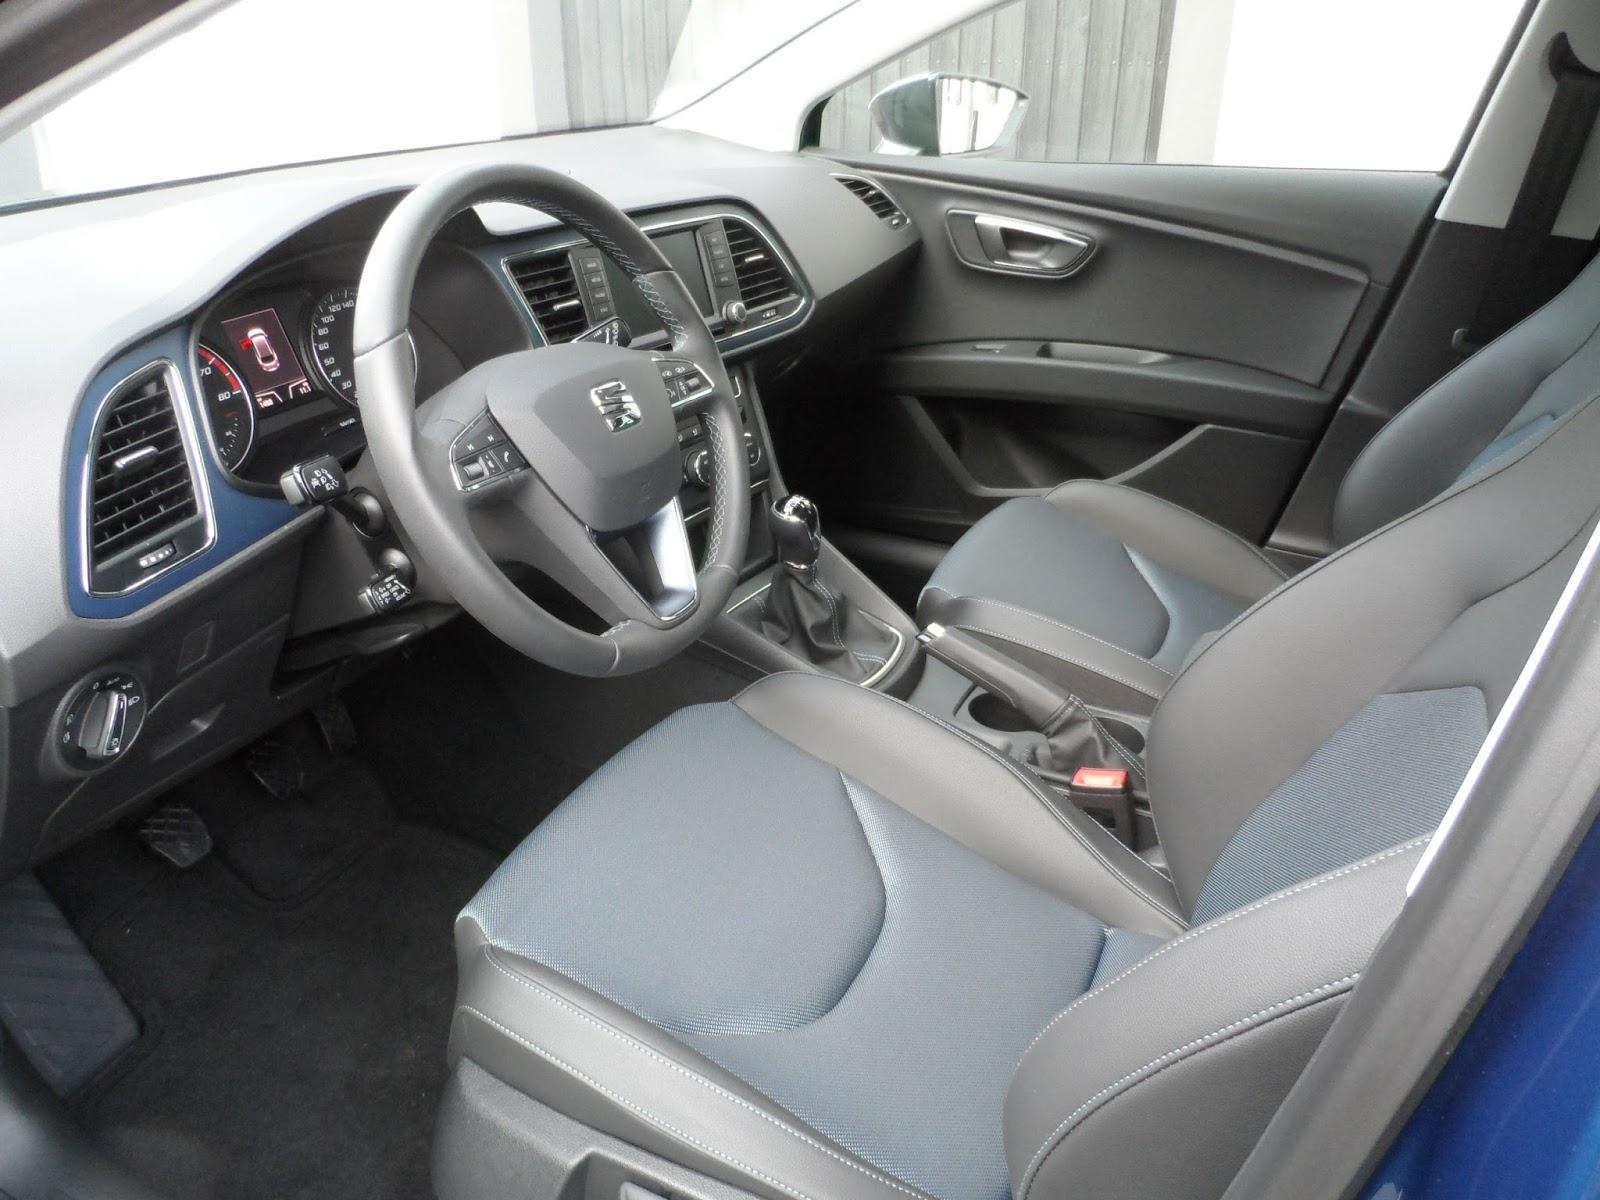 auto und verkehr: Olè, olè – Fahrspaß mit dem Seat Leon ST - Version ...